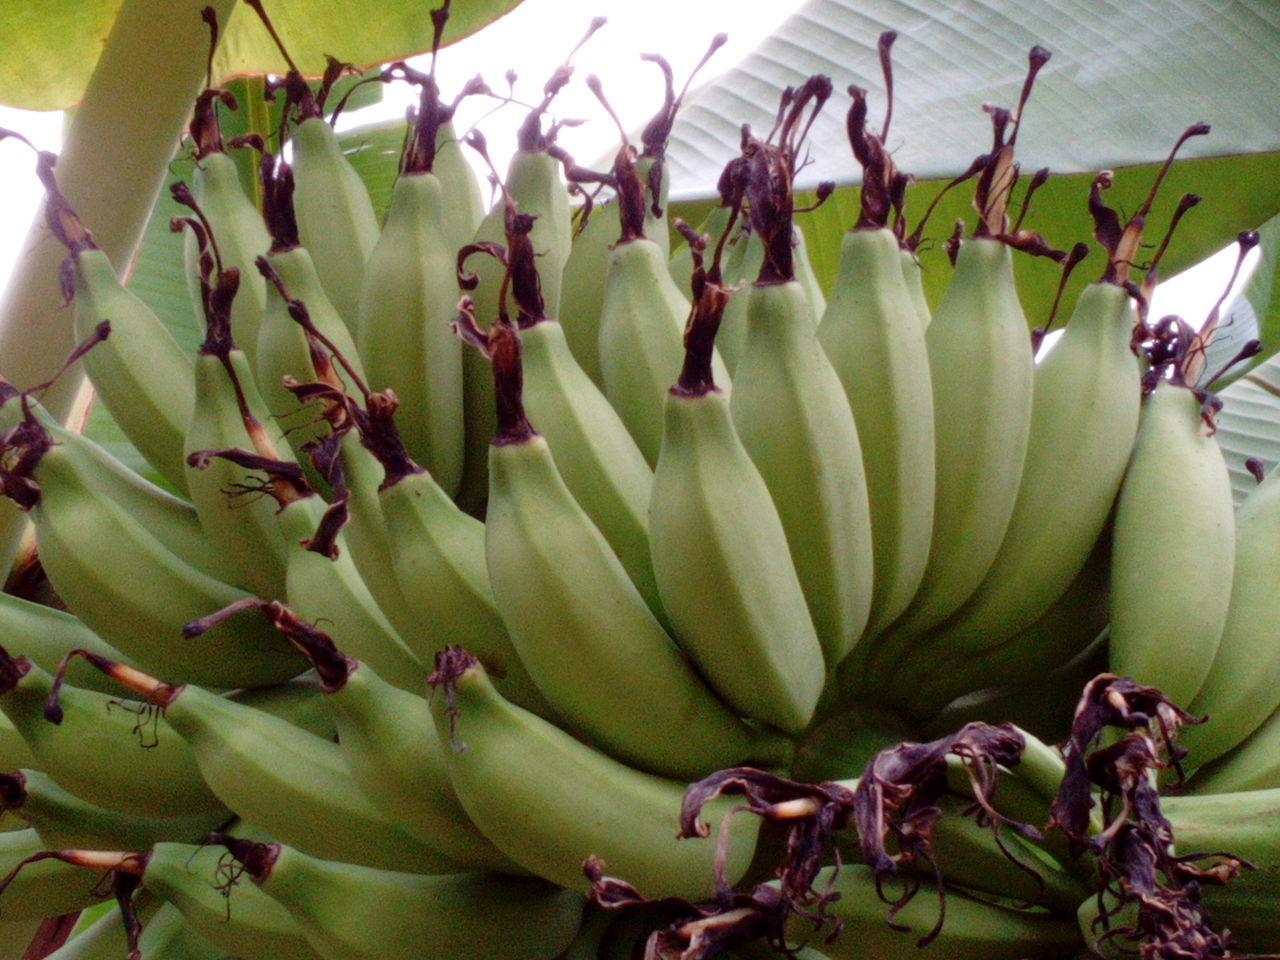 Bananas Organic Food Green Bananas Banana Tree Healthy Food Fruit Jakarta Indonesia